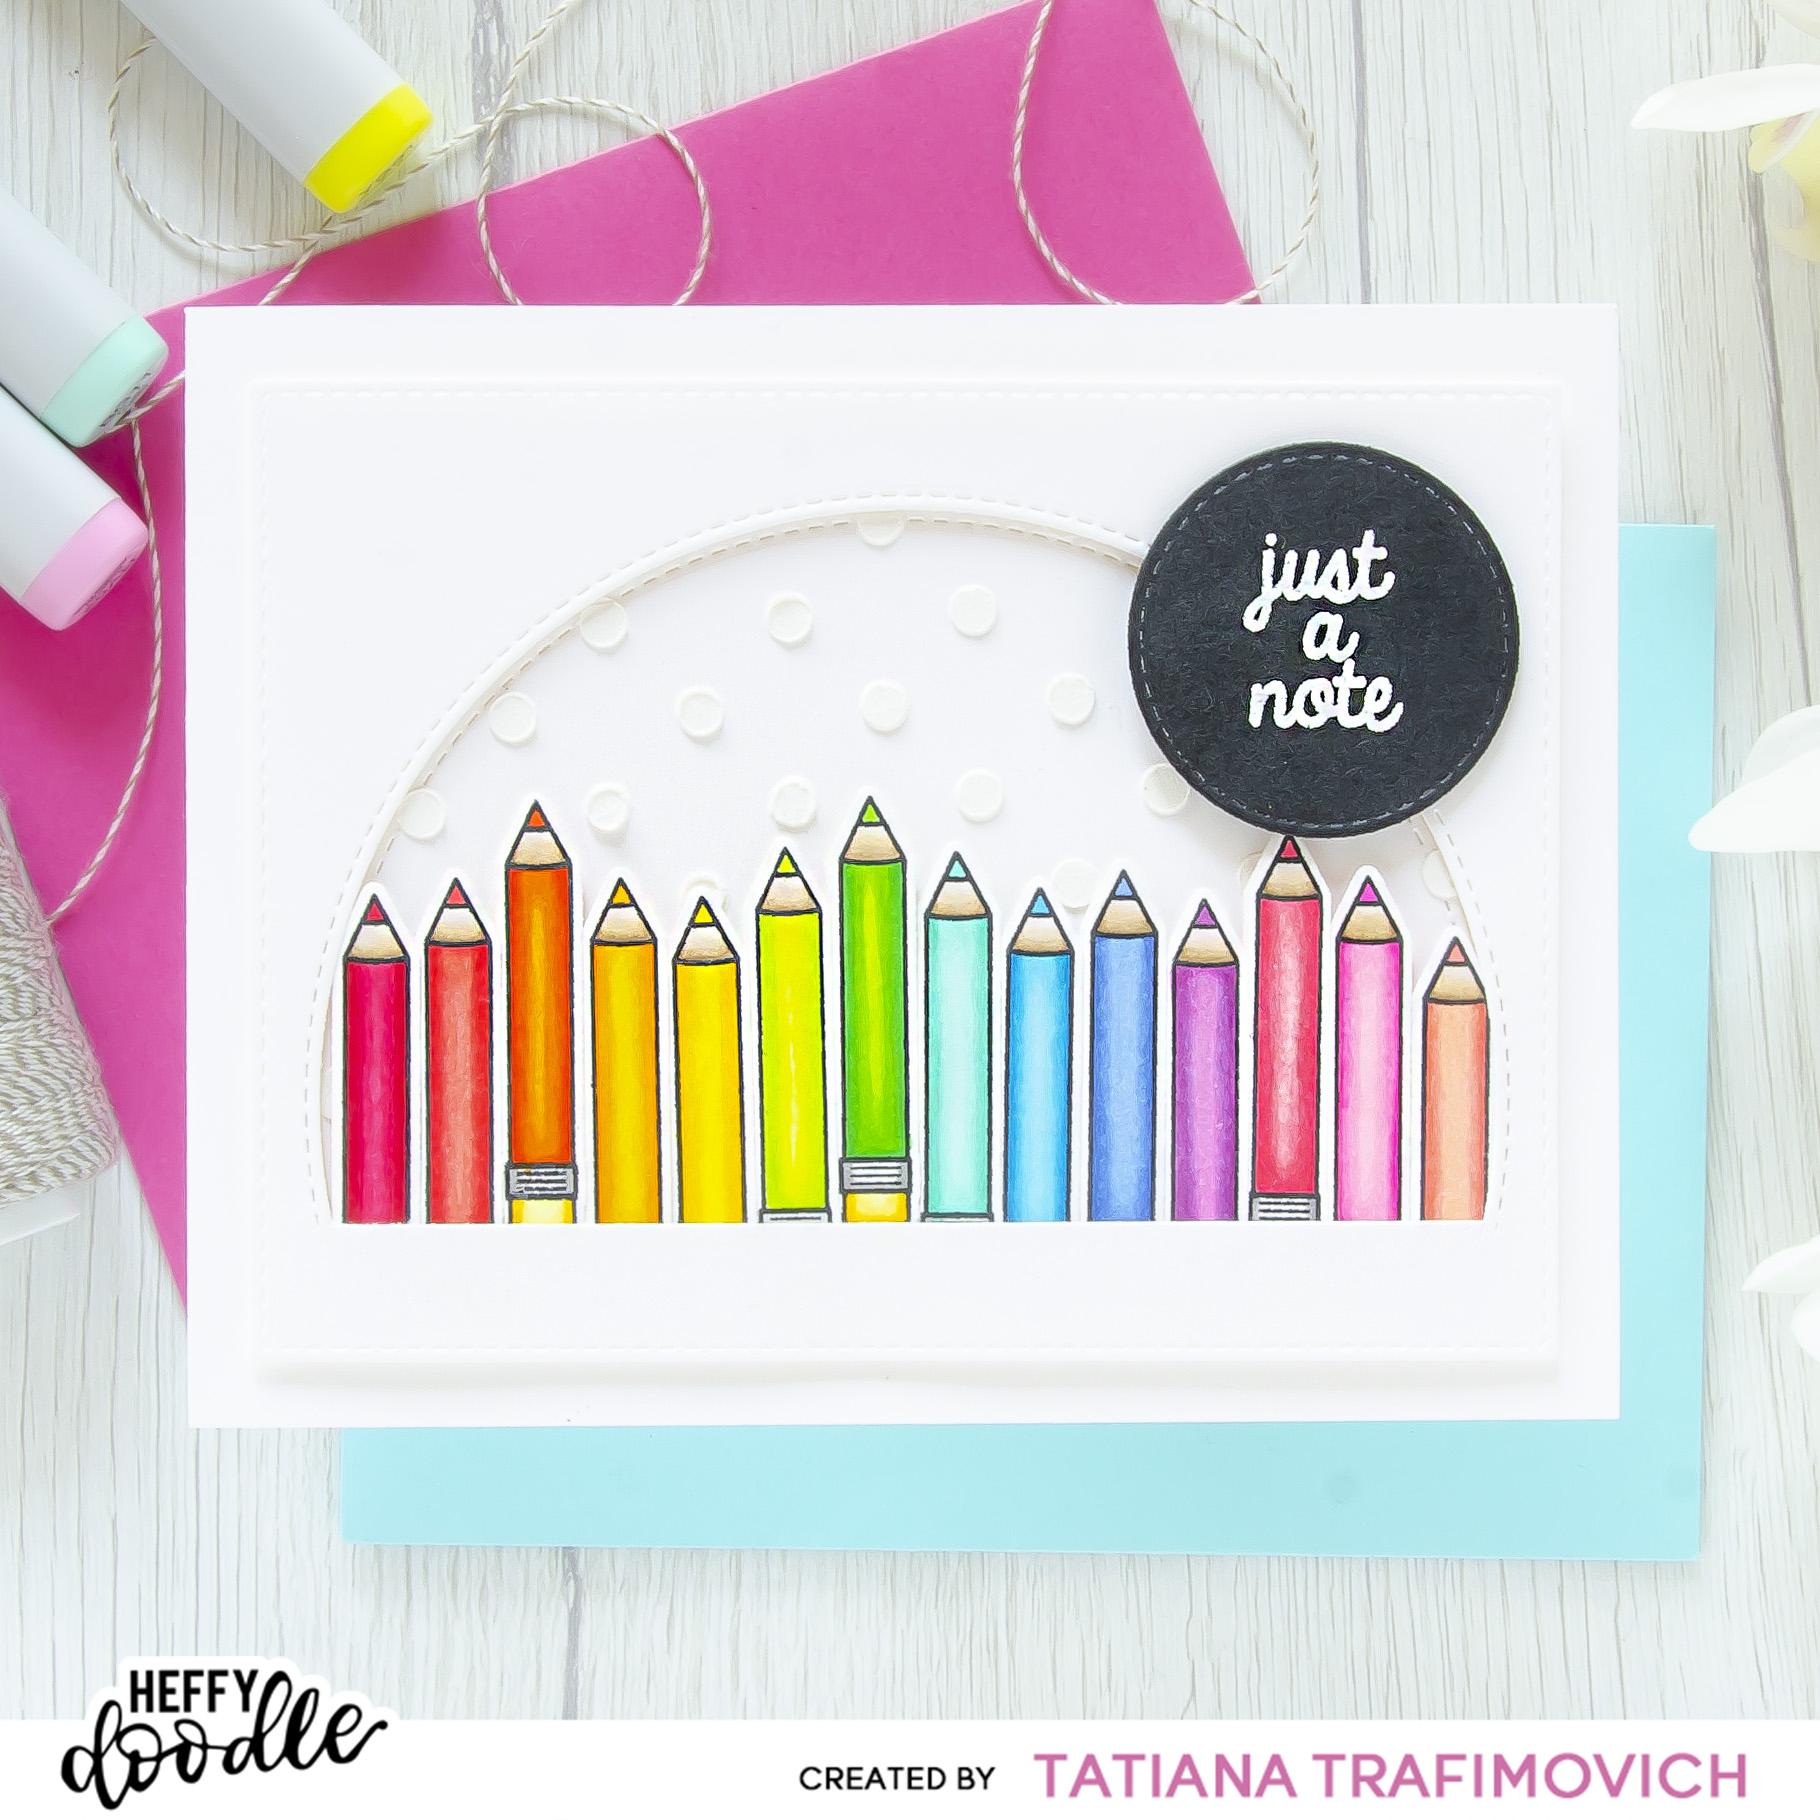 Just A Note rainbow #handmade card by Tatiana Trafimovich #tatianacraftandart - Just A Note Stamp Set by Heffy Doodle #heffydoodle